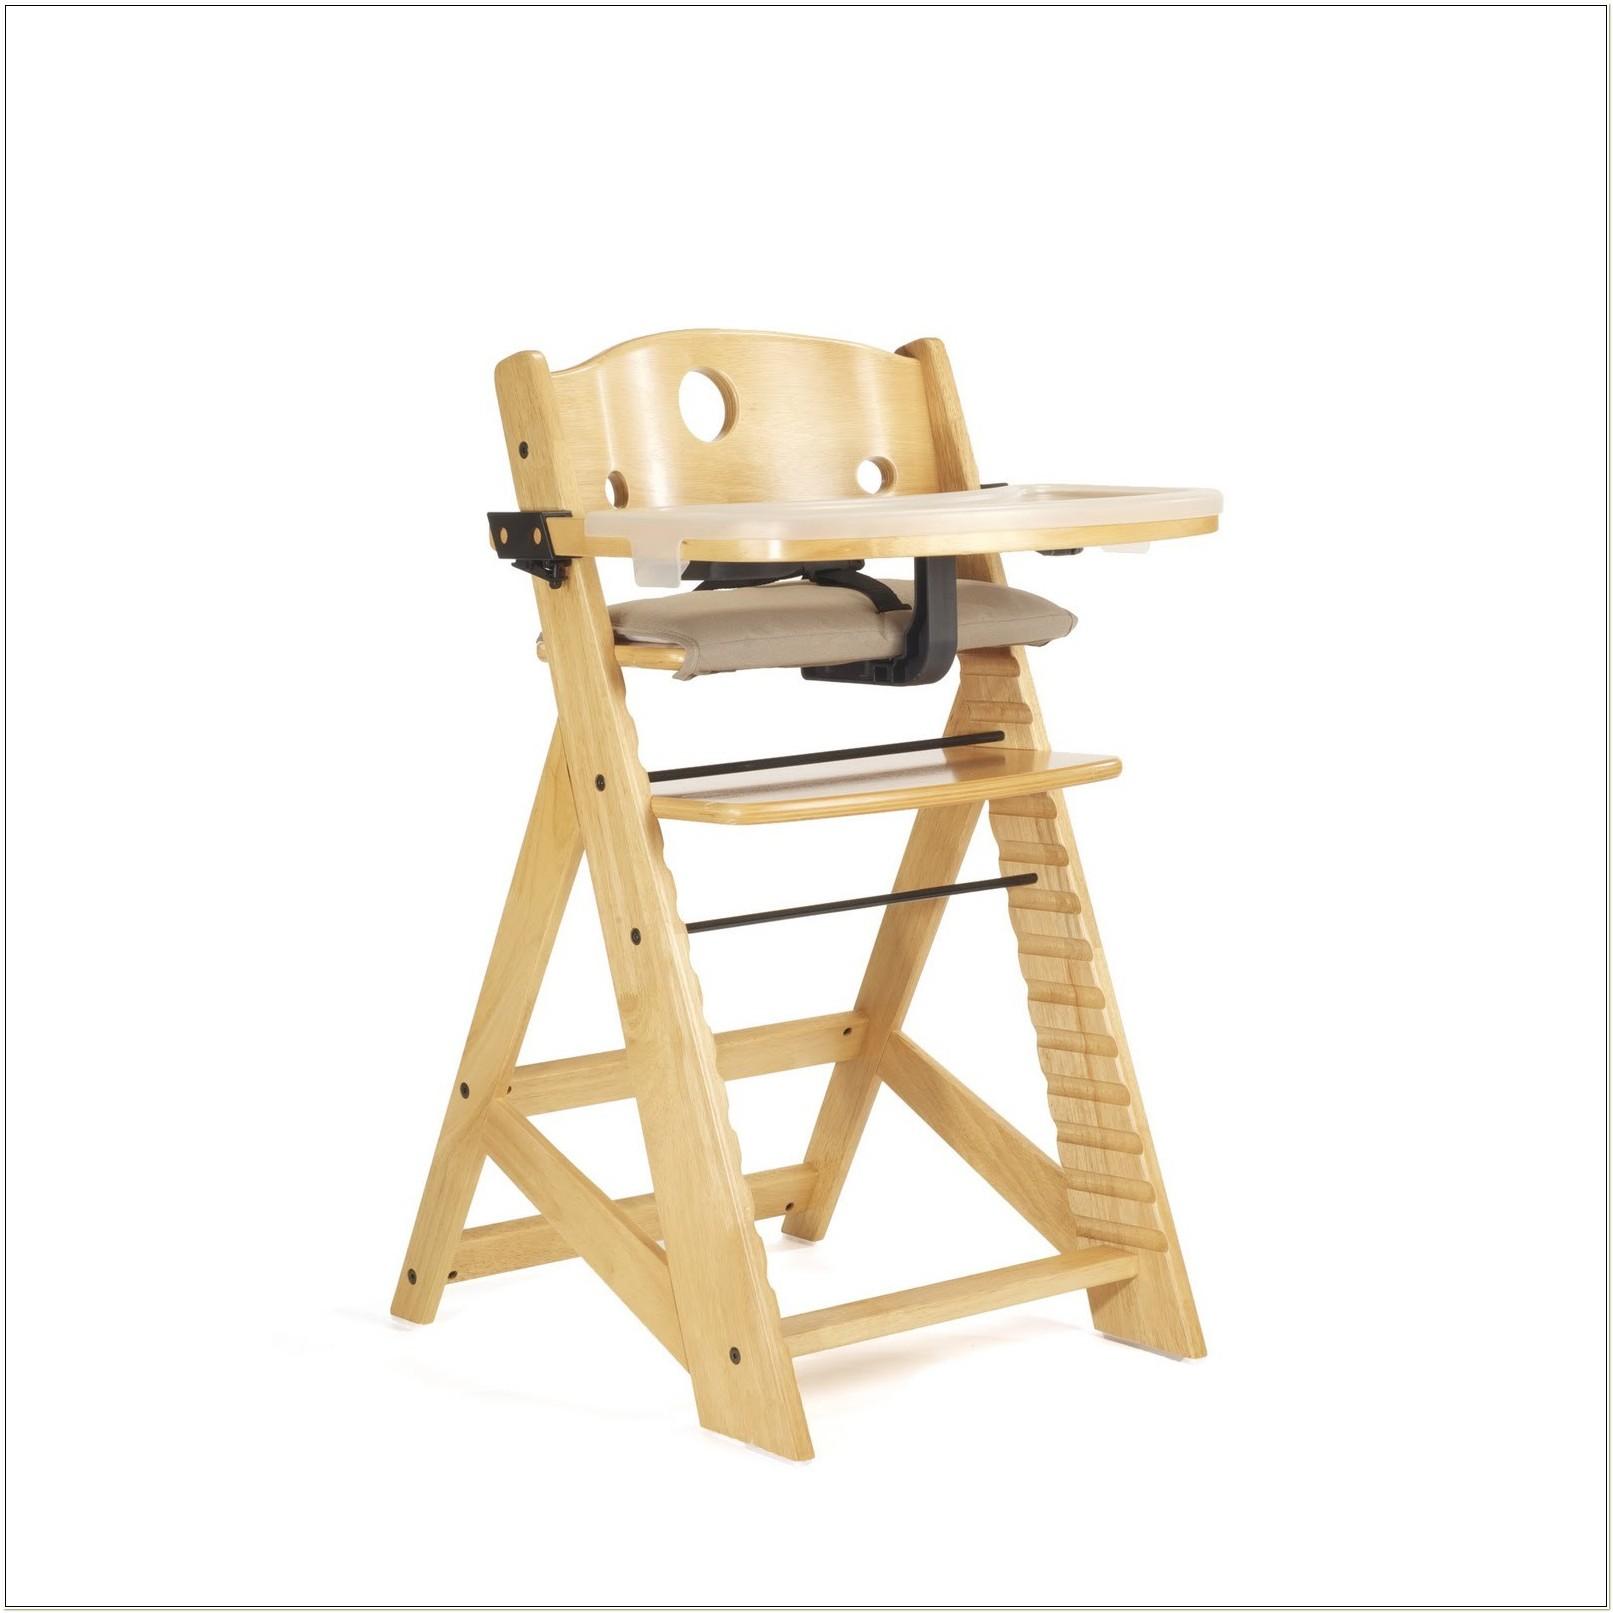 High Chair Like Stokke Tripp Trapp